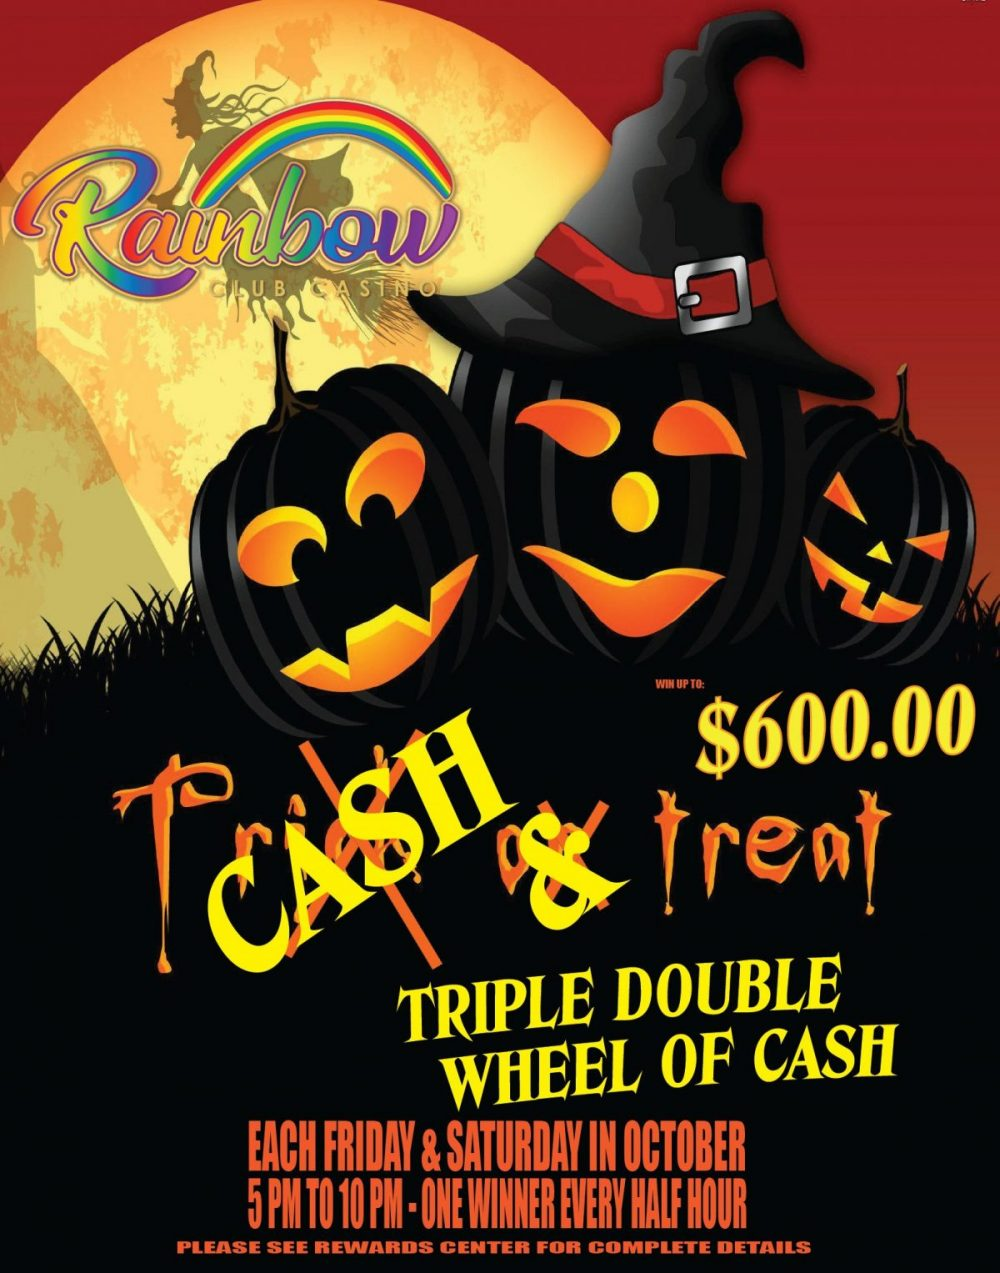 October Wheel of cash